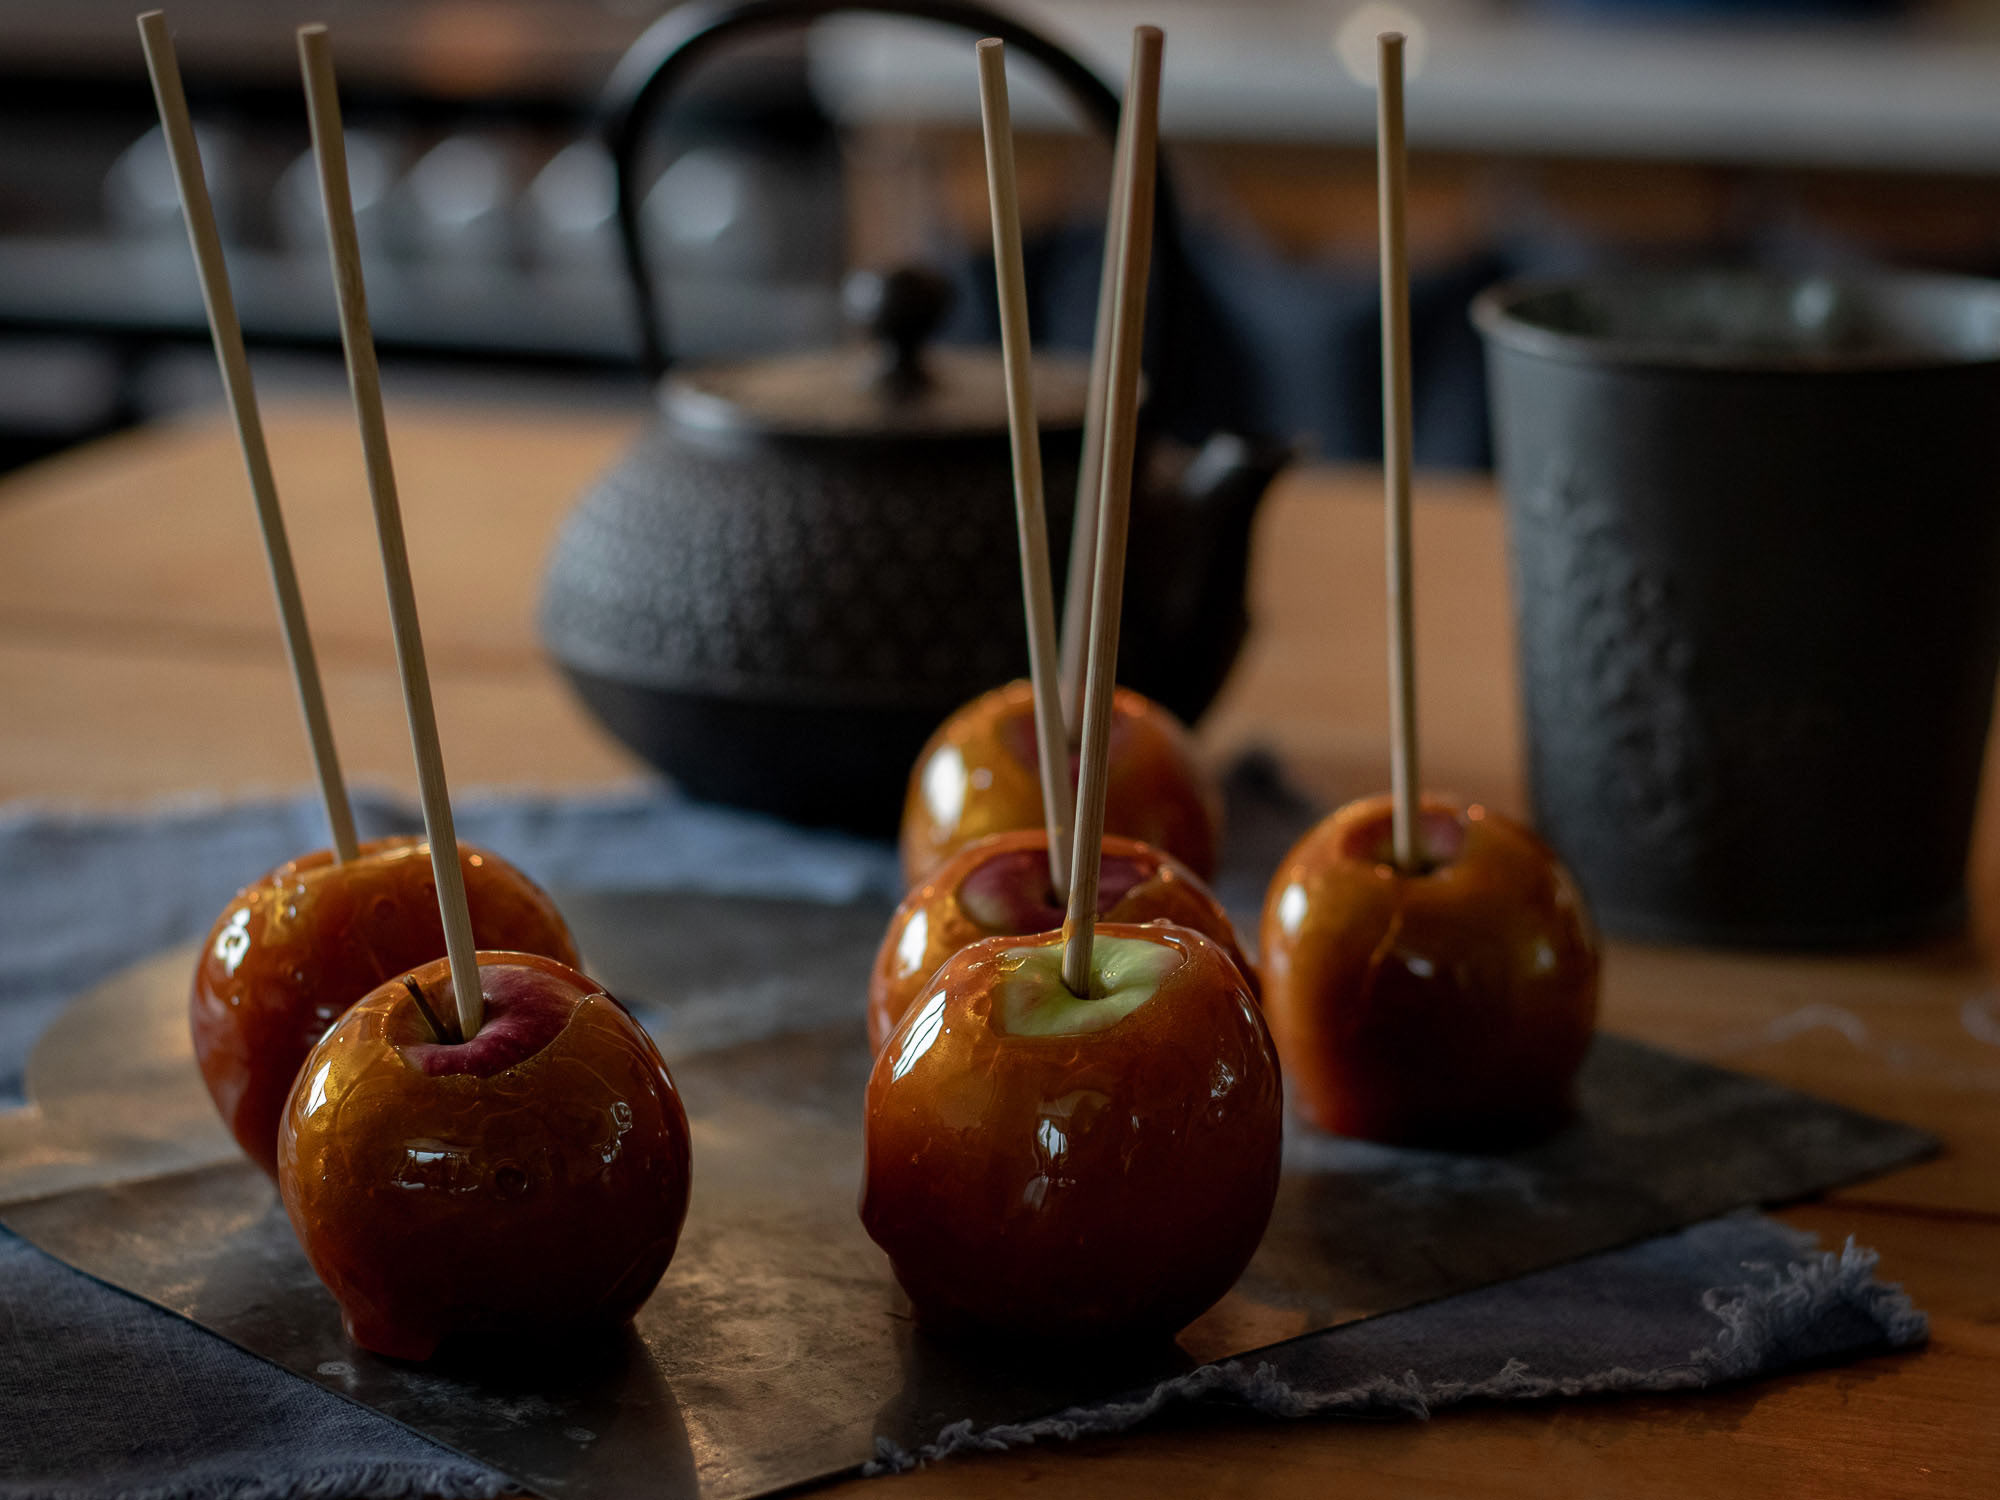 sugar glazed apples on a stick